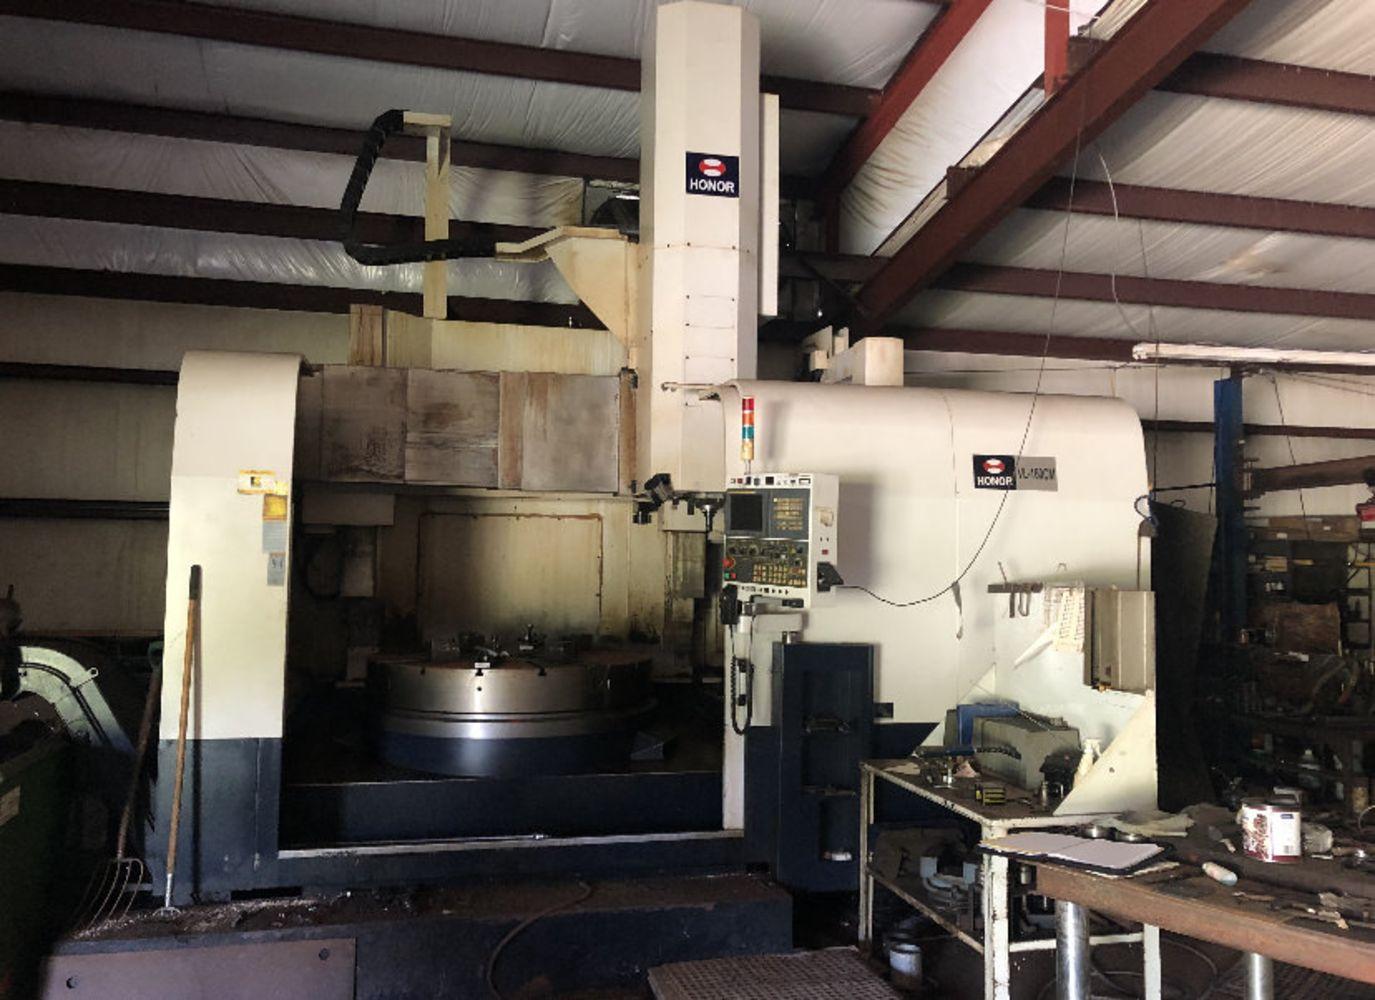 Weins Machine Shop - Huge Machine Shop and Fabrication Facility